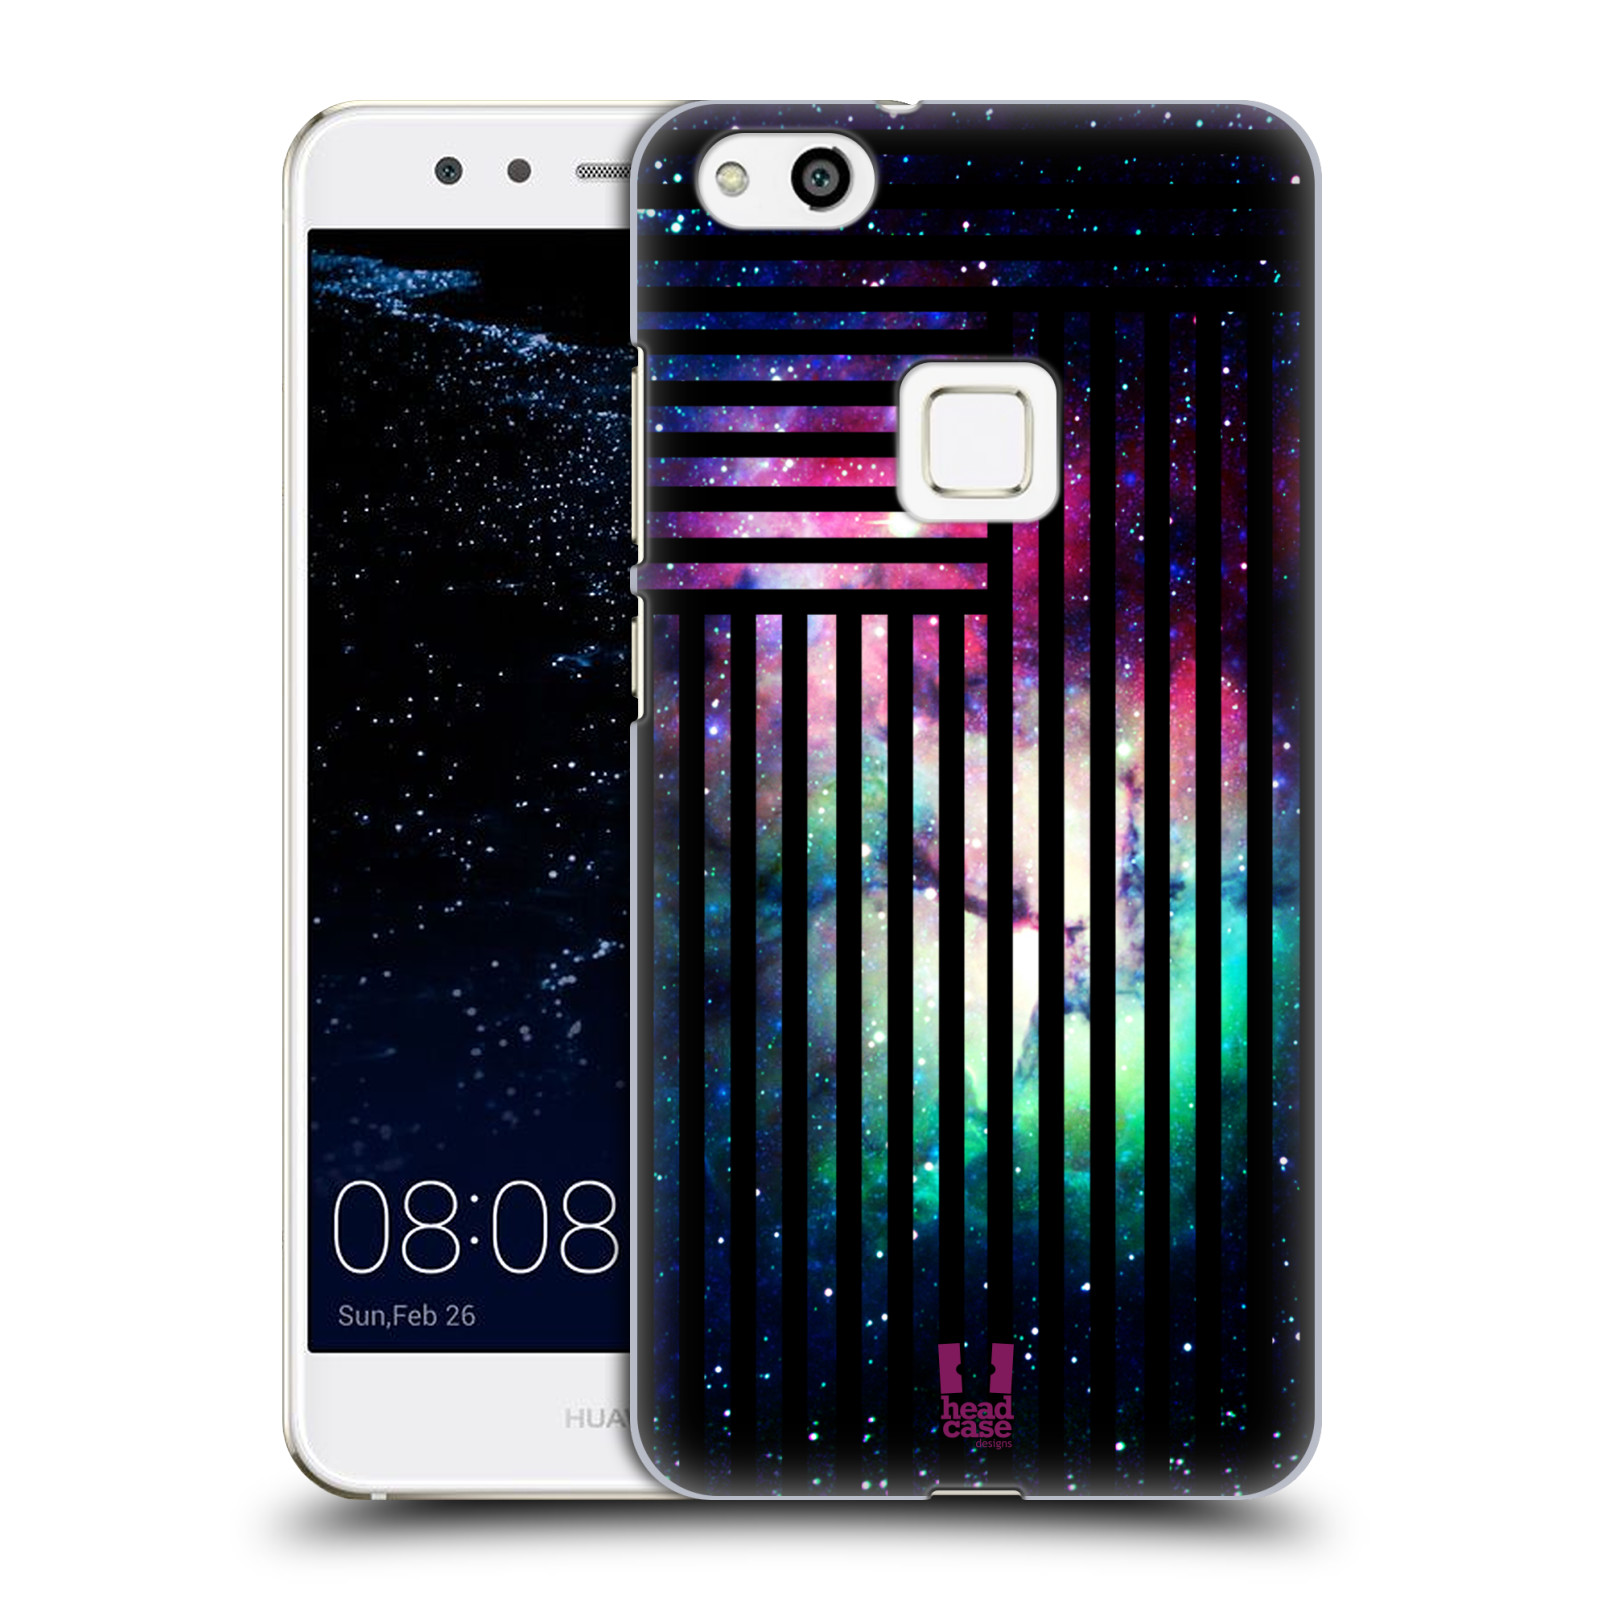 Plastové pouzdro na mobil Huawei P10 Lite Head Case - MIX NEBULA STRIPES (Plastový kryt či obal na mobilní telefon Huawei P10 Lite Dual SIM (LX1/LX1A))